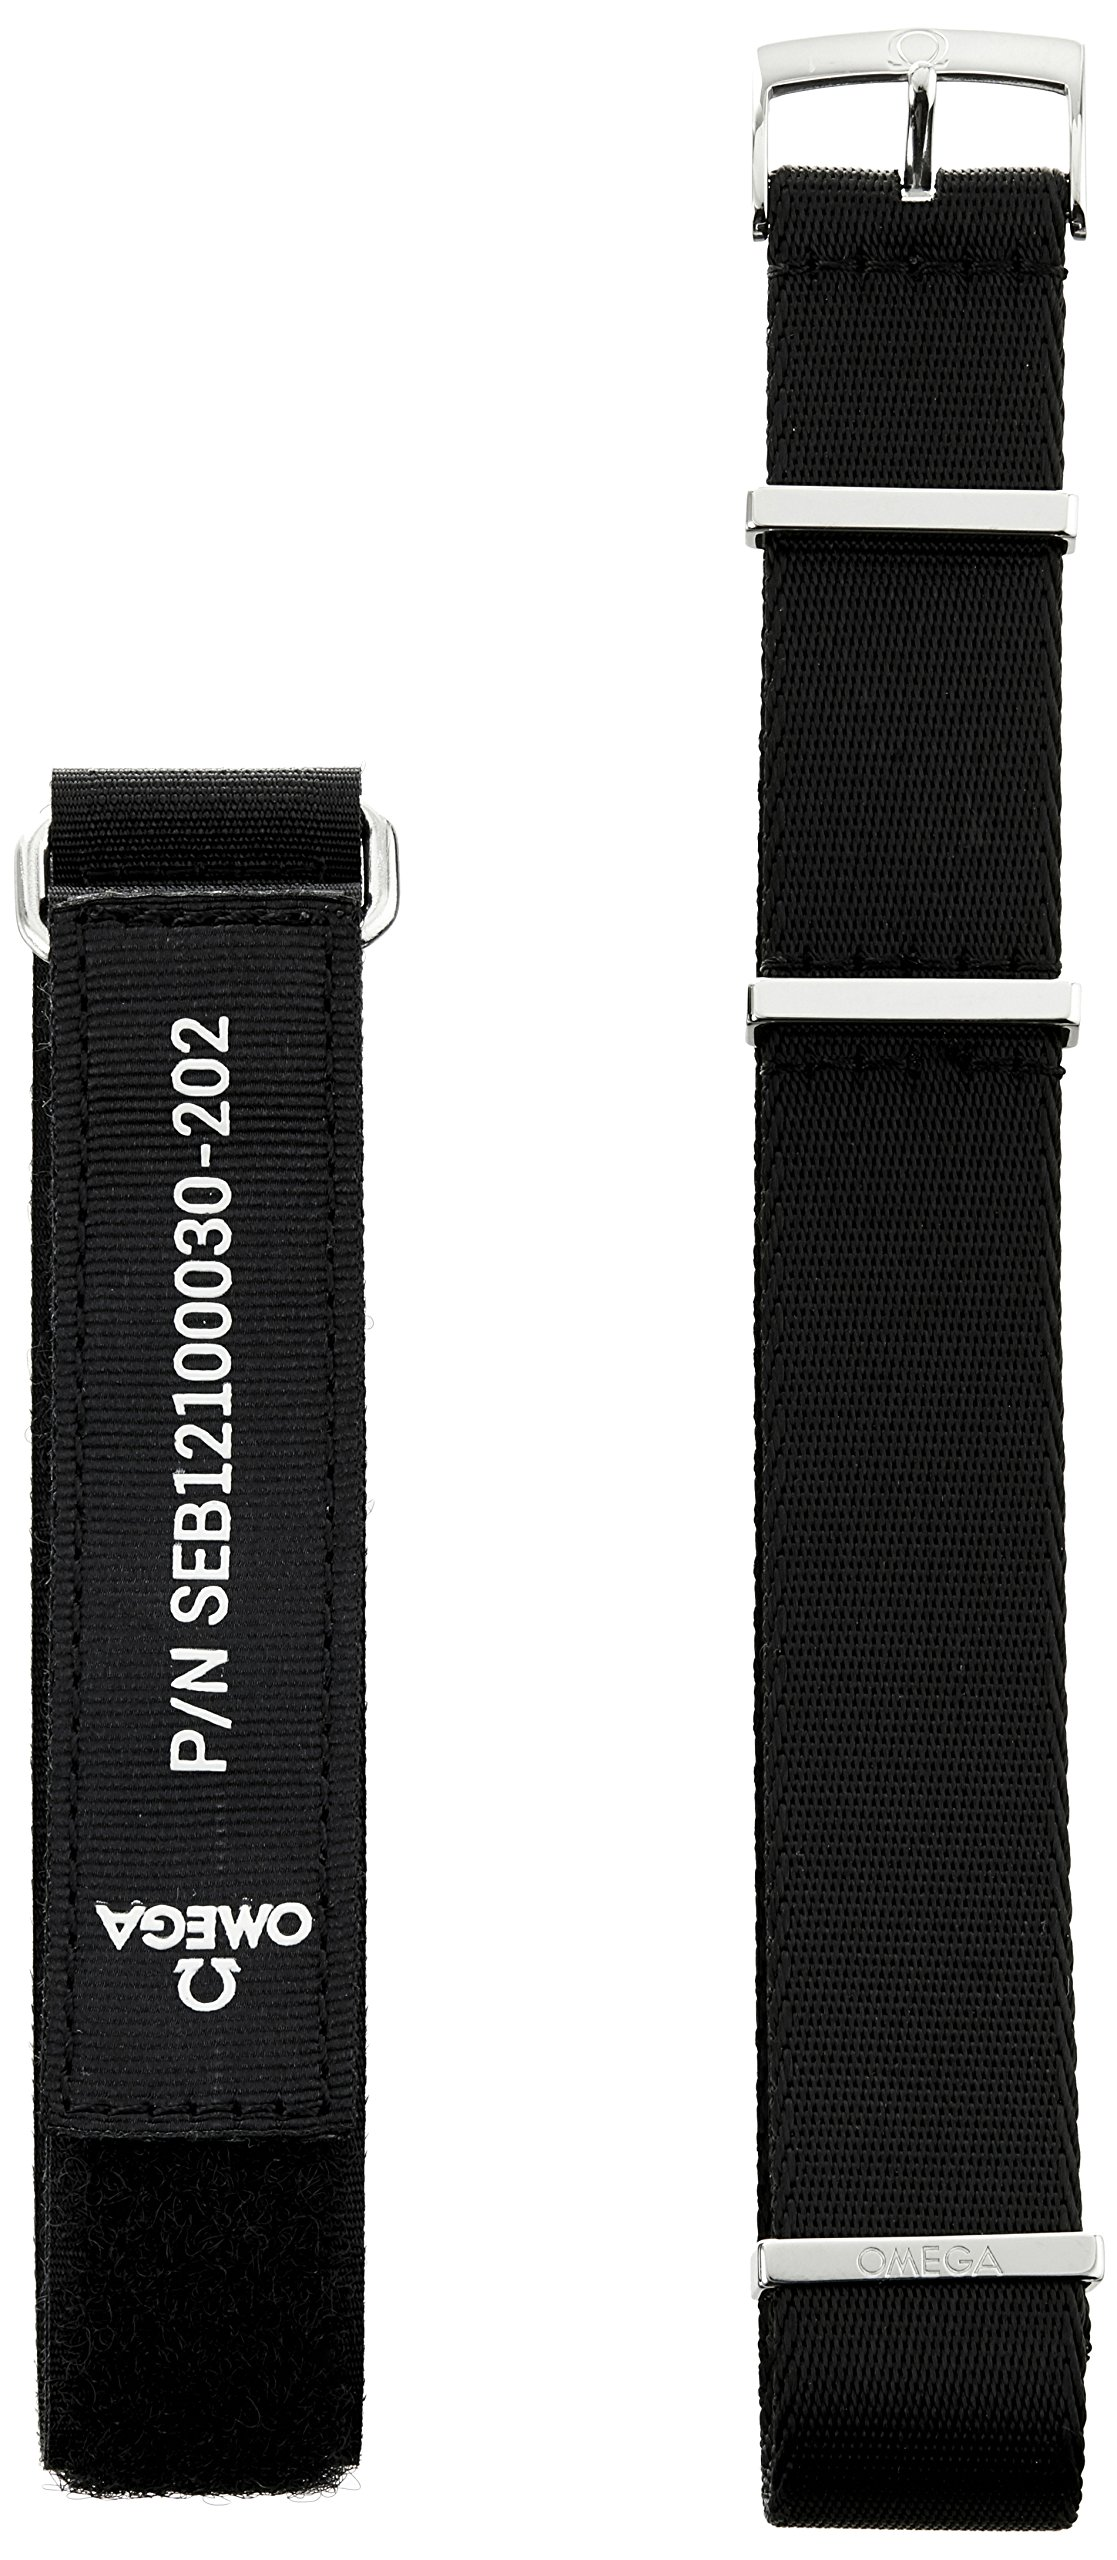 "Omega Speedmaster Professional ""Moonwatch"" - Reloj (Reloj de Pulsera, Acero Inoxidable, Acero Inoxidable, Acero Inoxidable, Acero Inoxidable, Hesalita) 2"